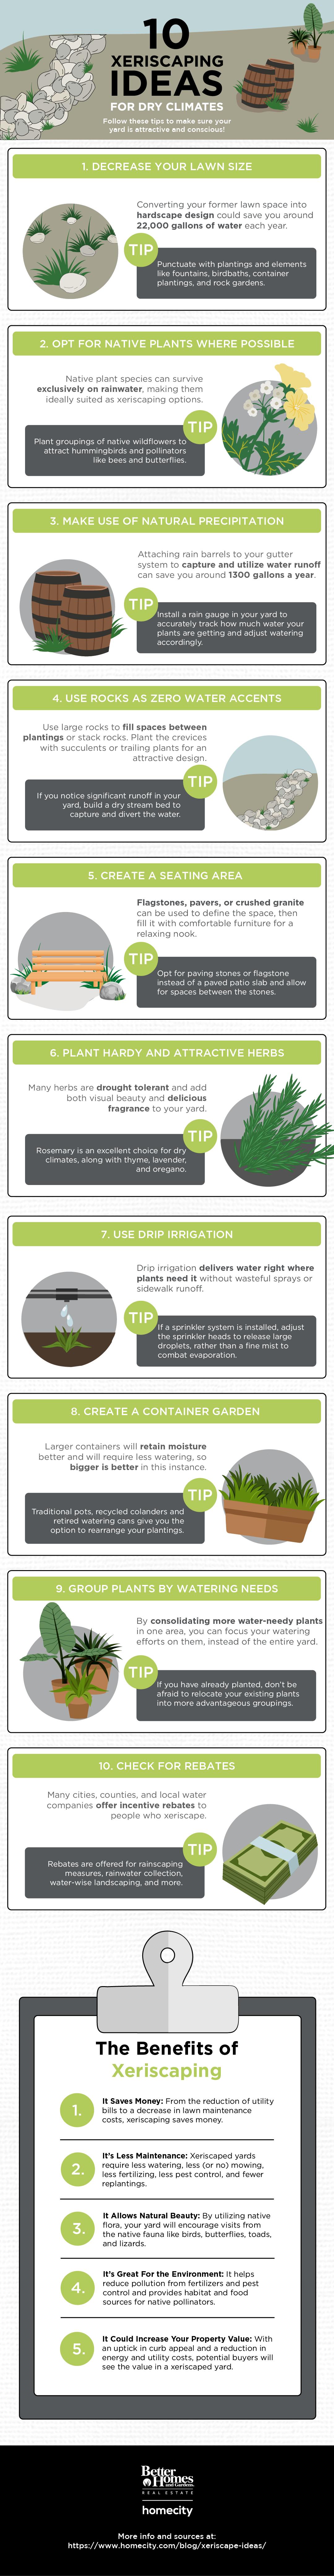 xeriscape garden design ideas